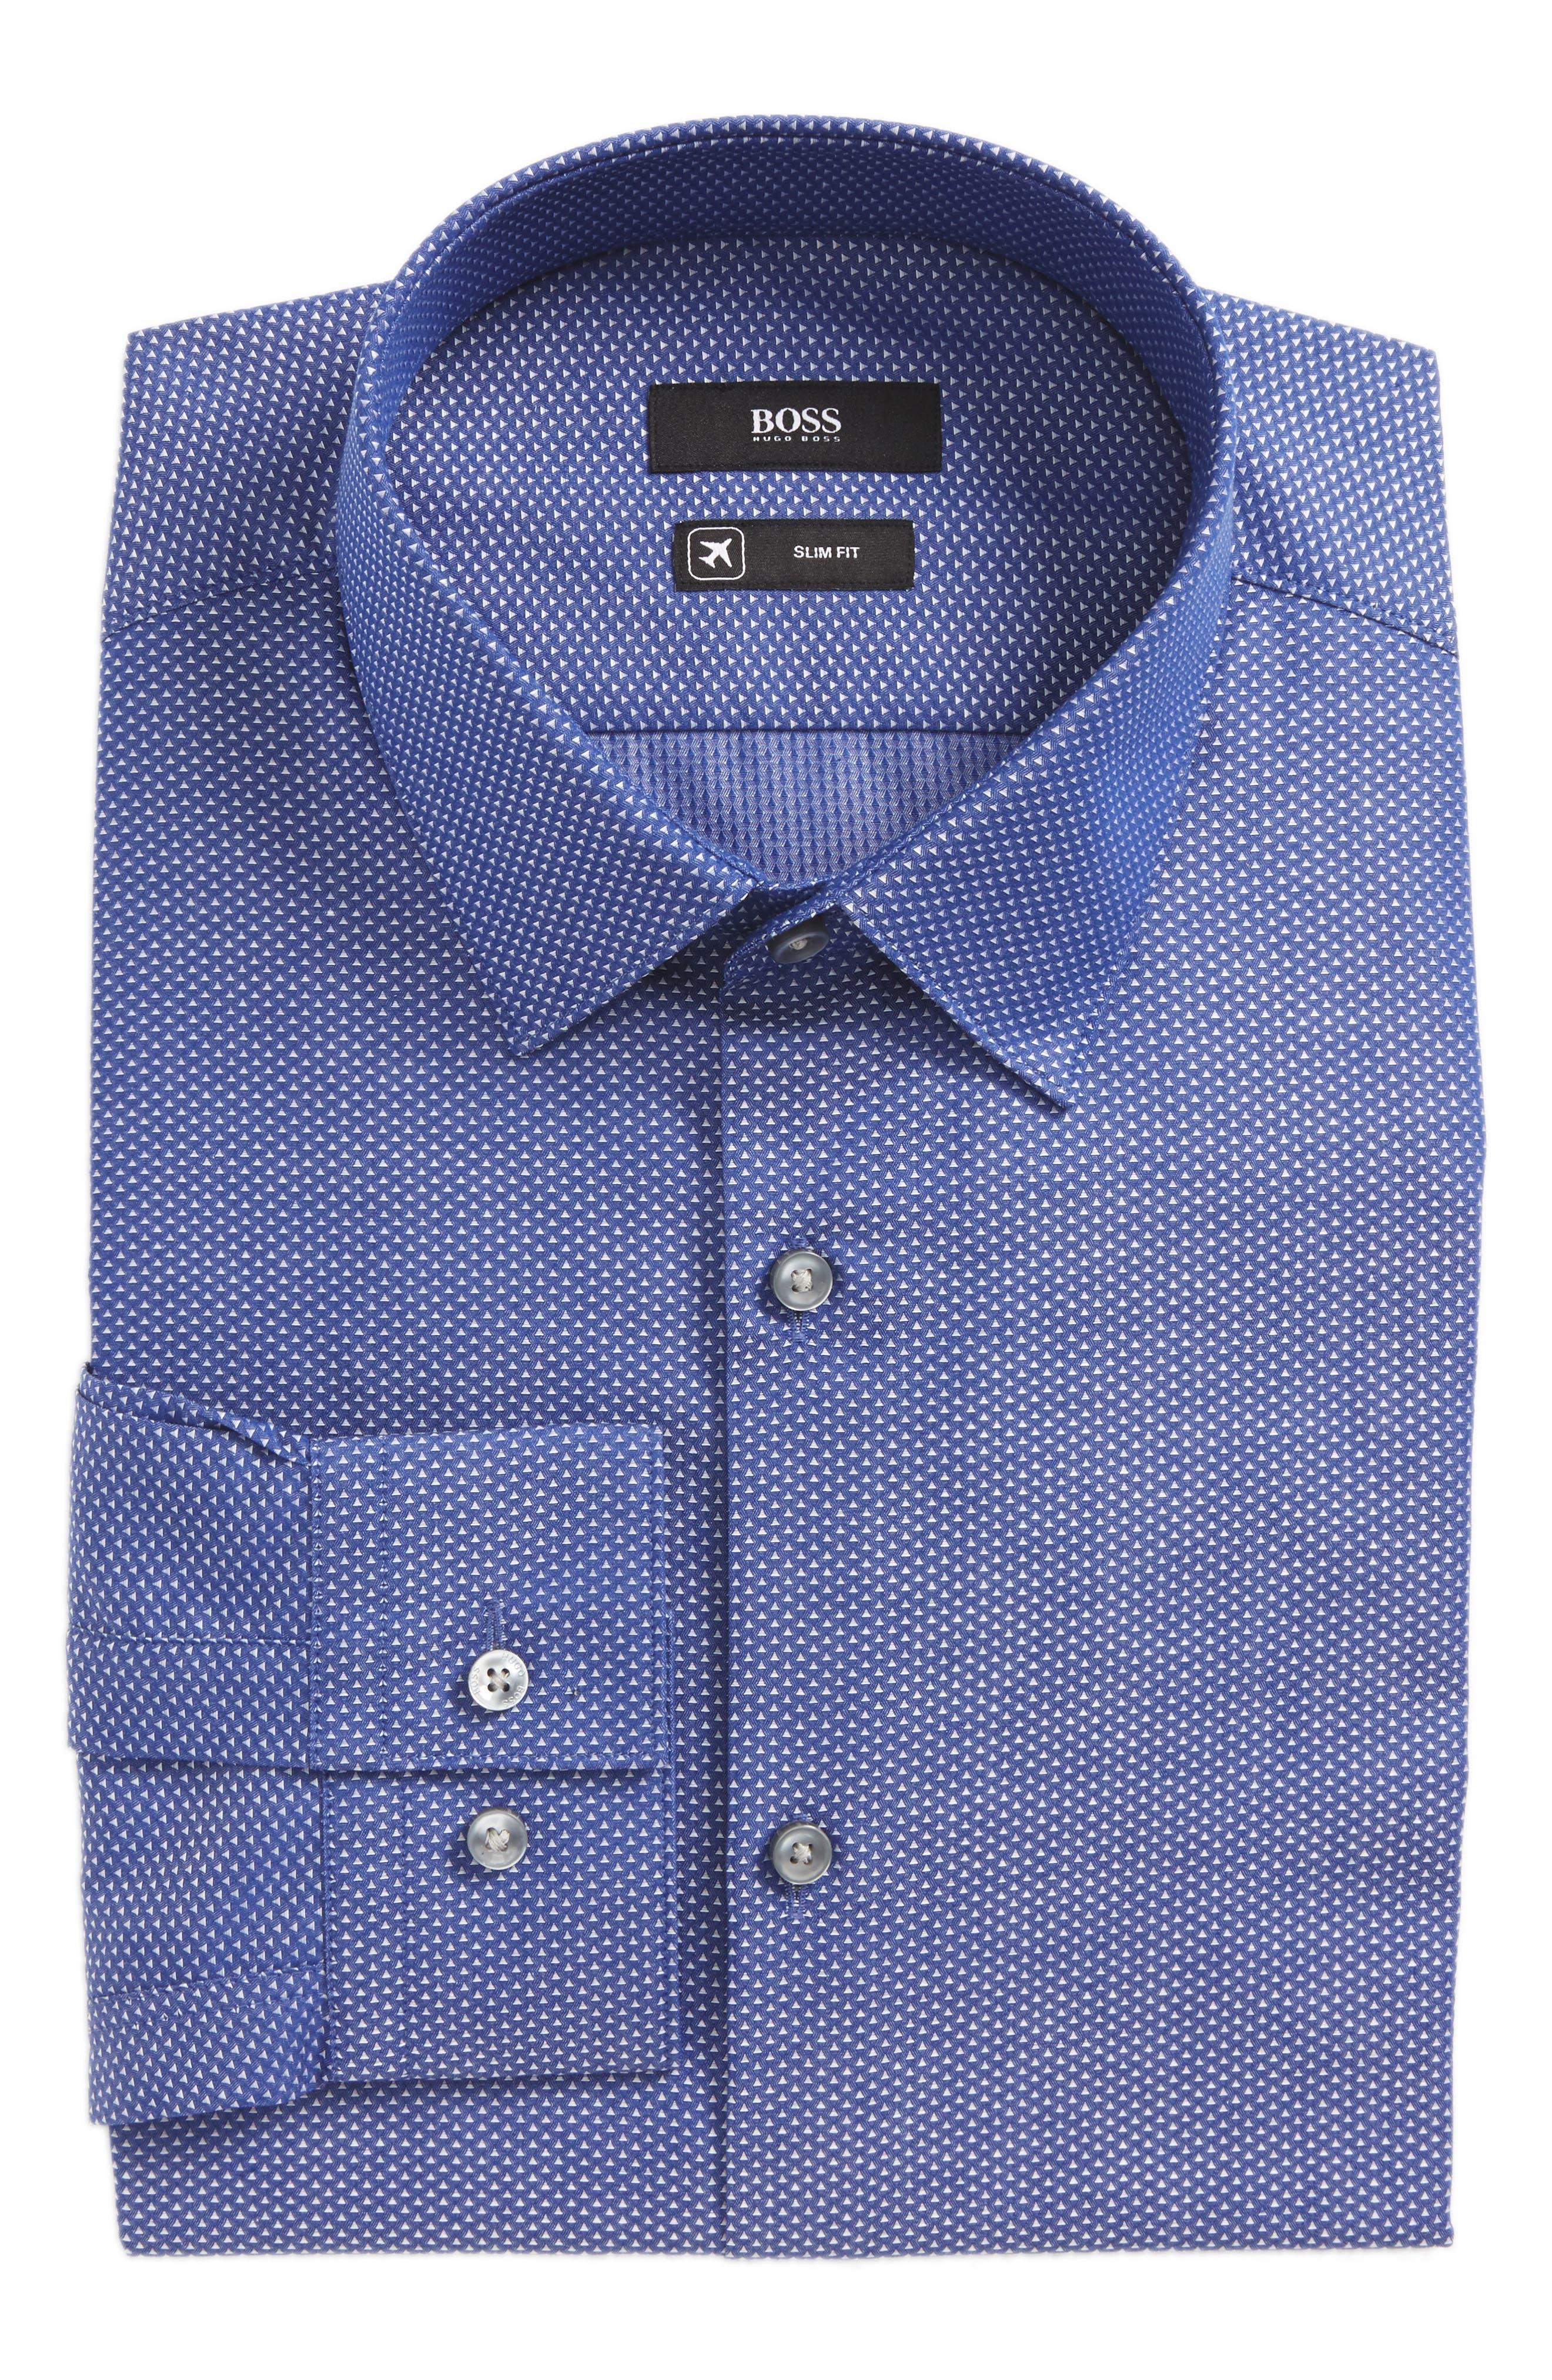 Isko Slim Fit Geometric Dress Shirt,                             Main thumbnail 1, color,